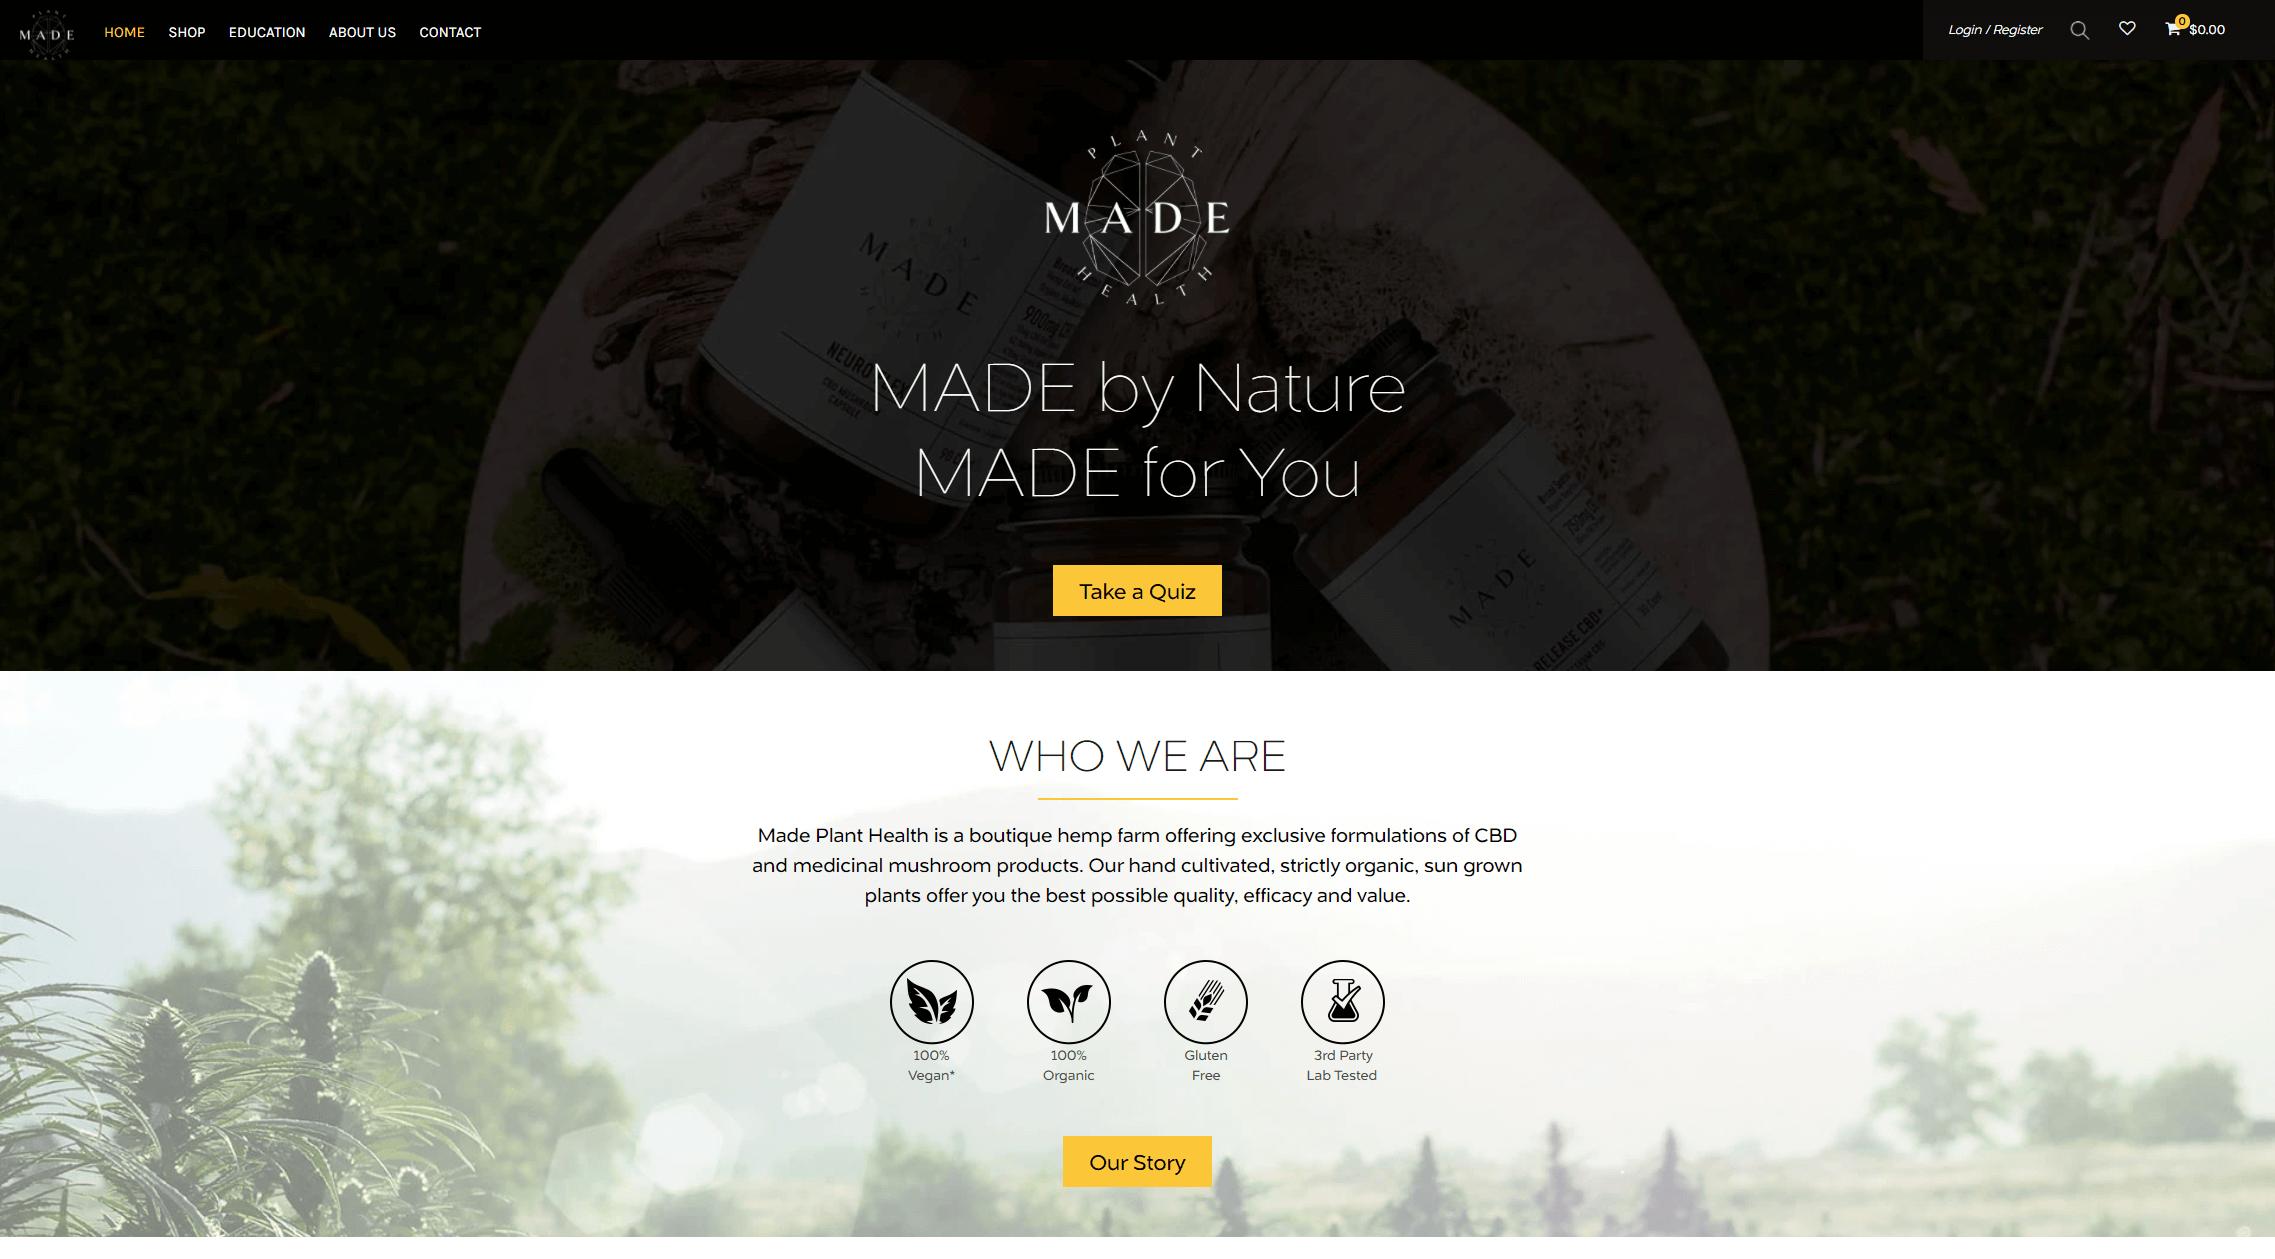 madeplanthealth.com